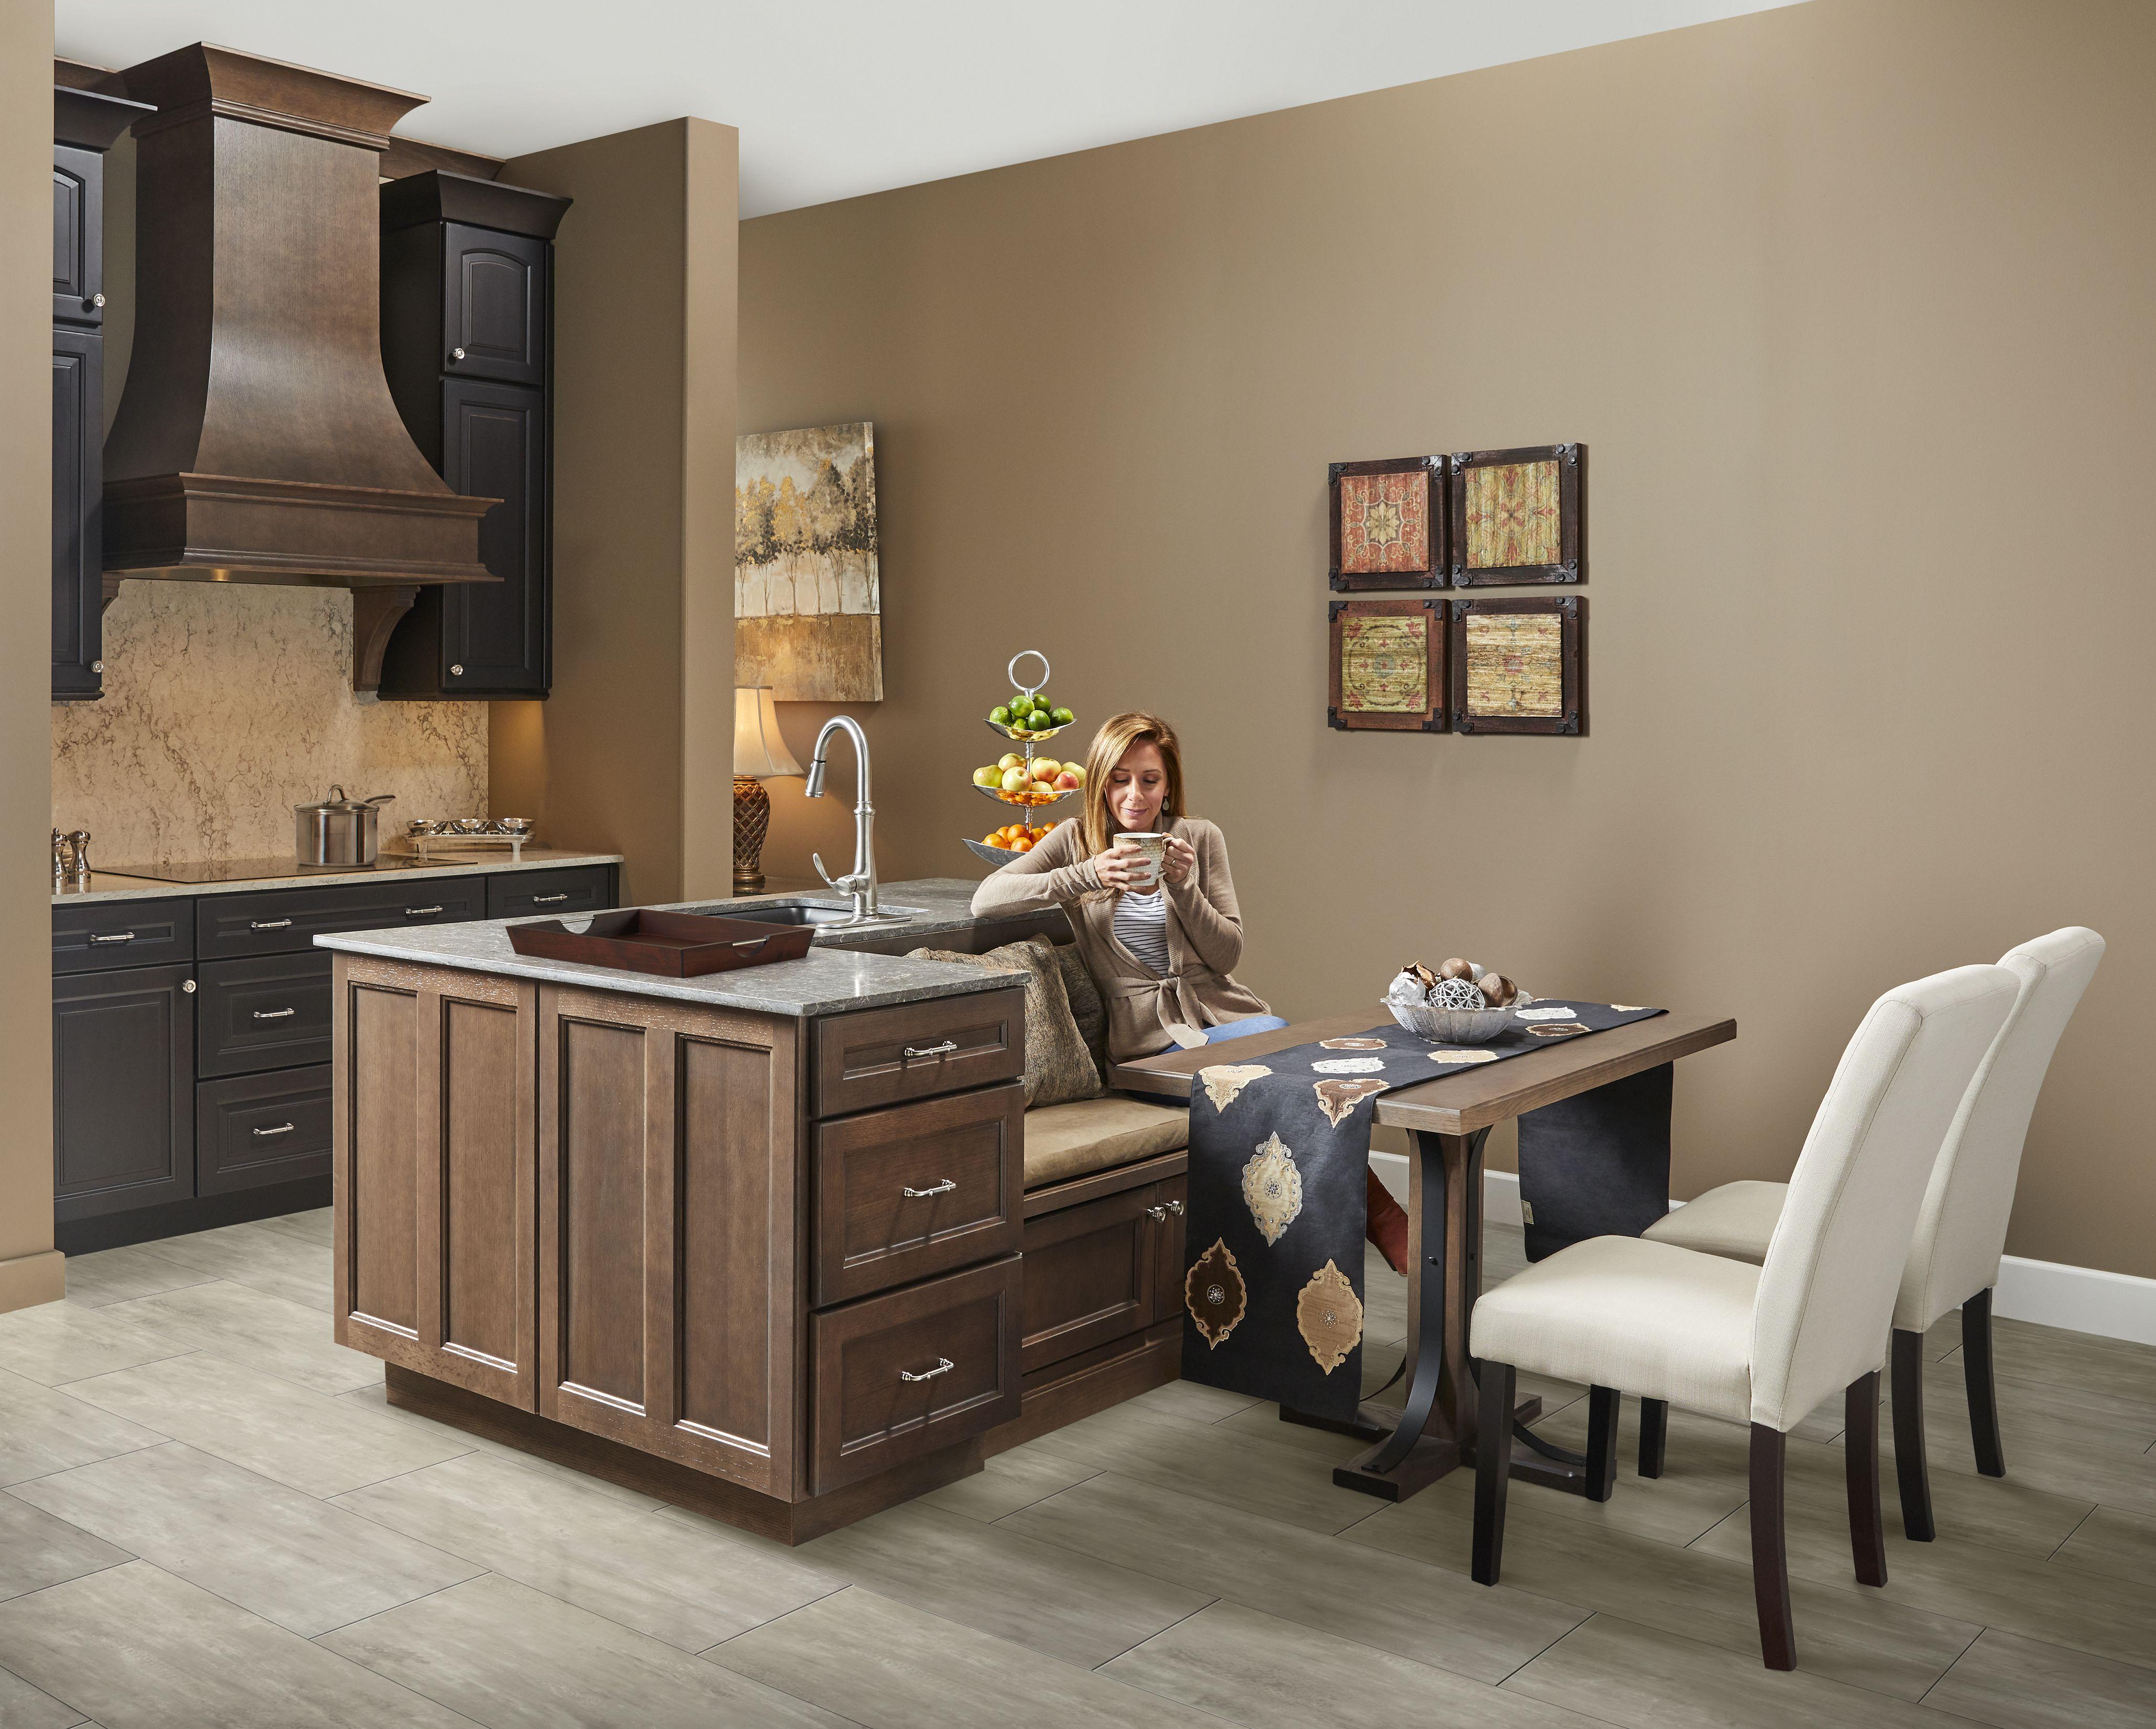 Traditional Farmhouse Kitchen Kitchen Cabinet Inspiration Wellborn Cabinets Quality Kitchen Cabinets